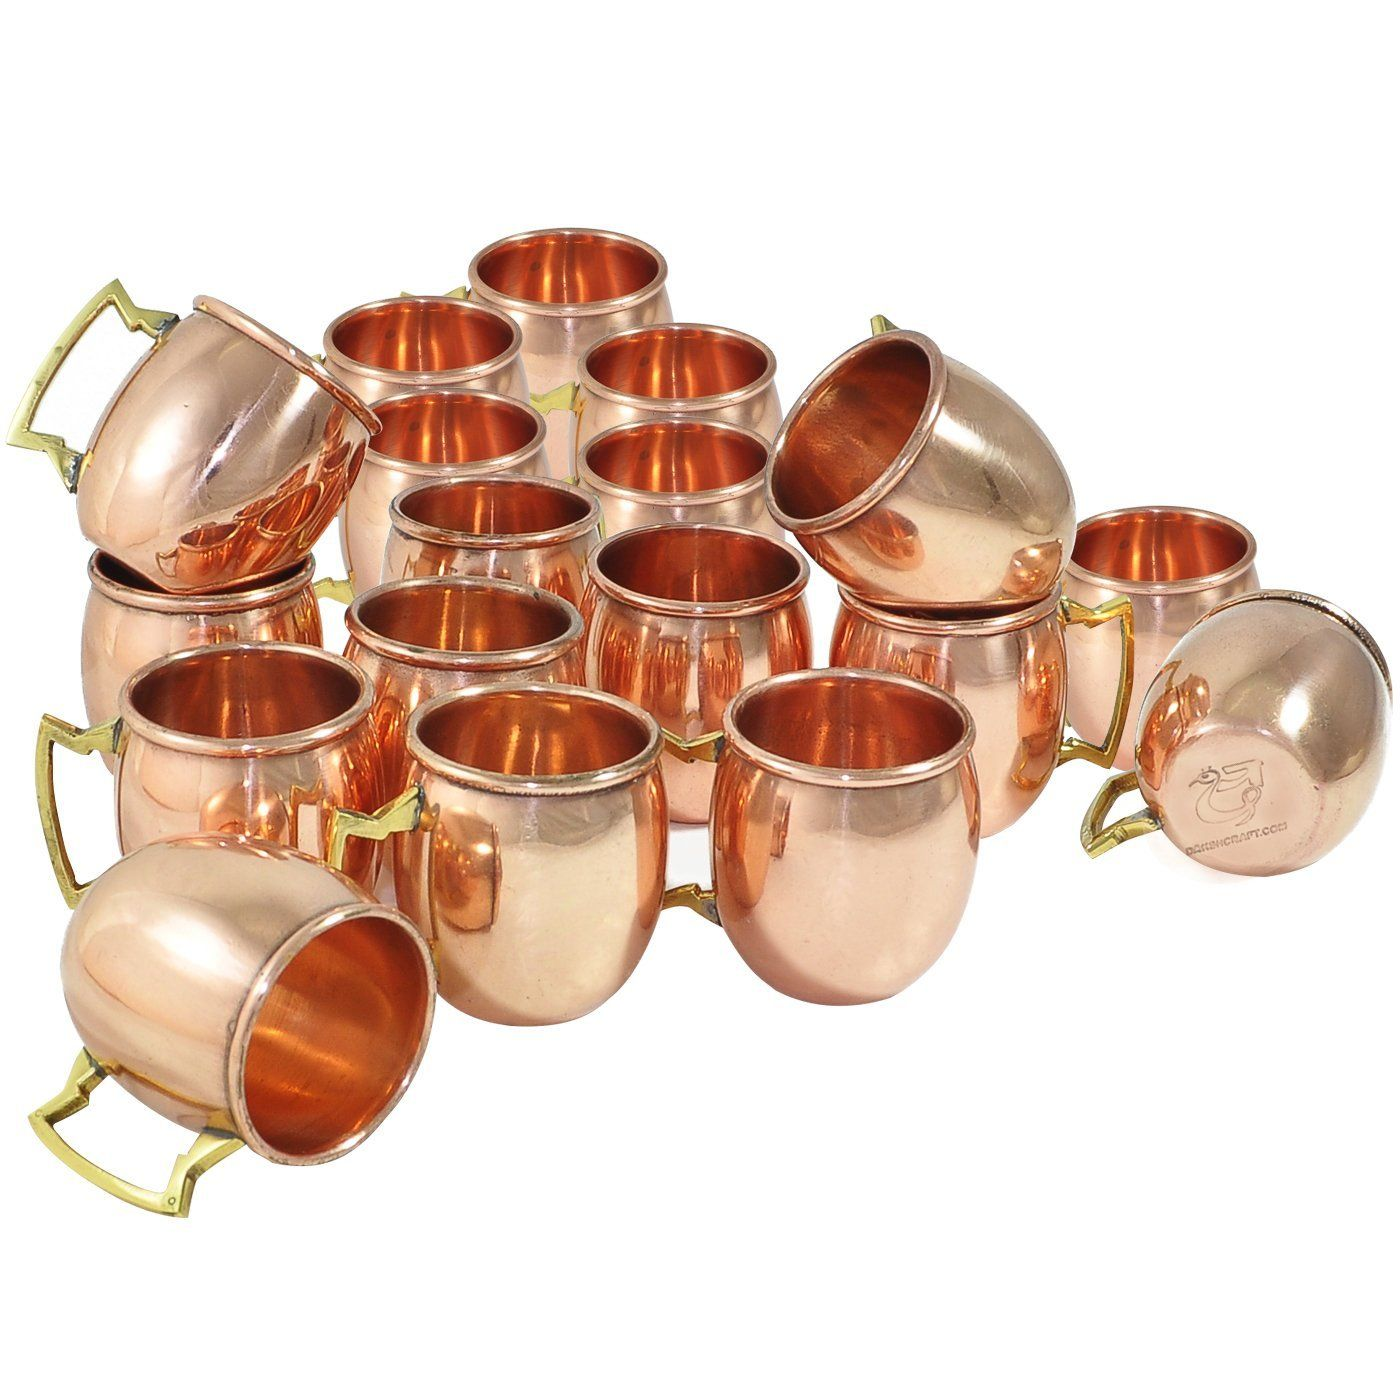 Amazon.com   DakshCraft ® Handmade Pure Copper Solid Shot Mugs(Capacity 2 oz), Set of 18: Beer Mugs & Steins